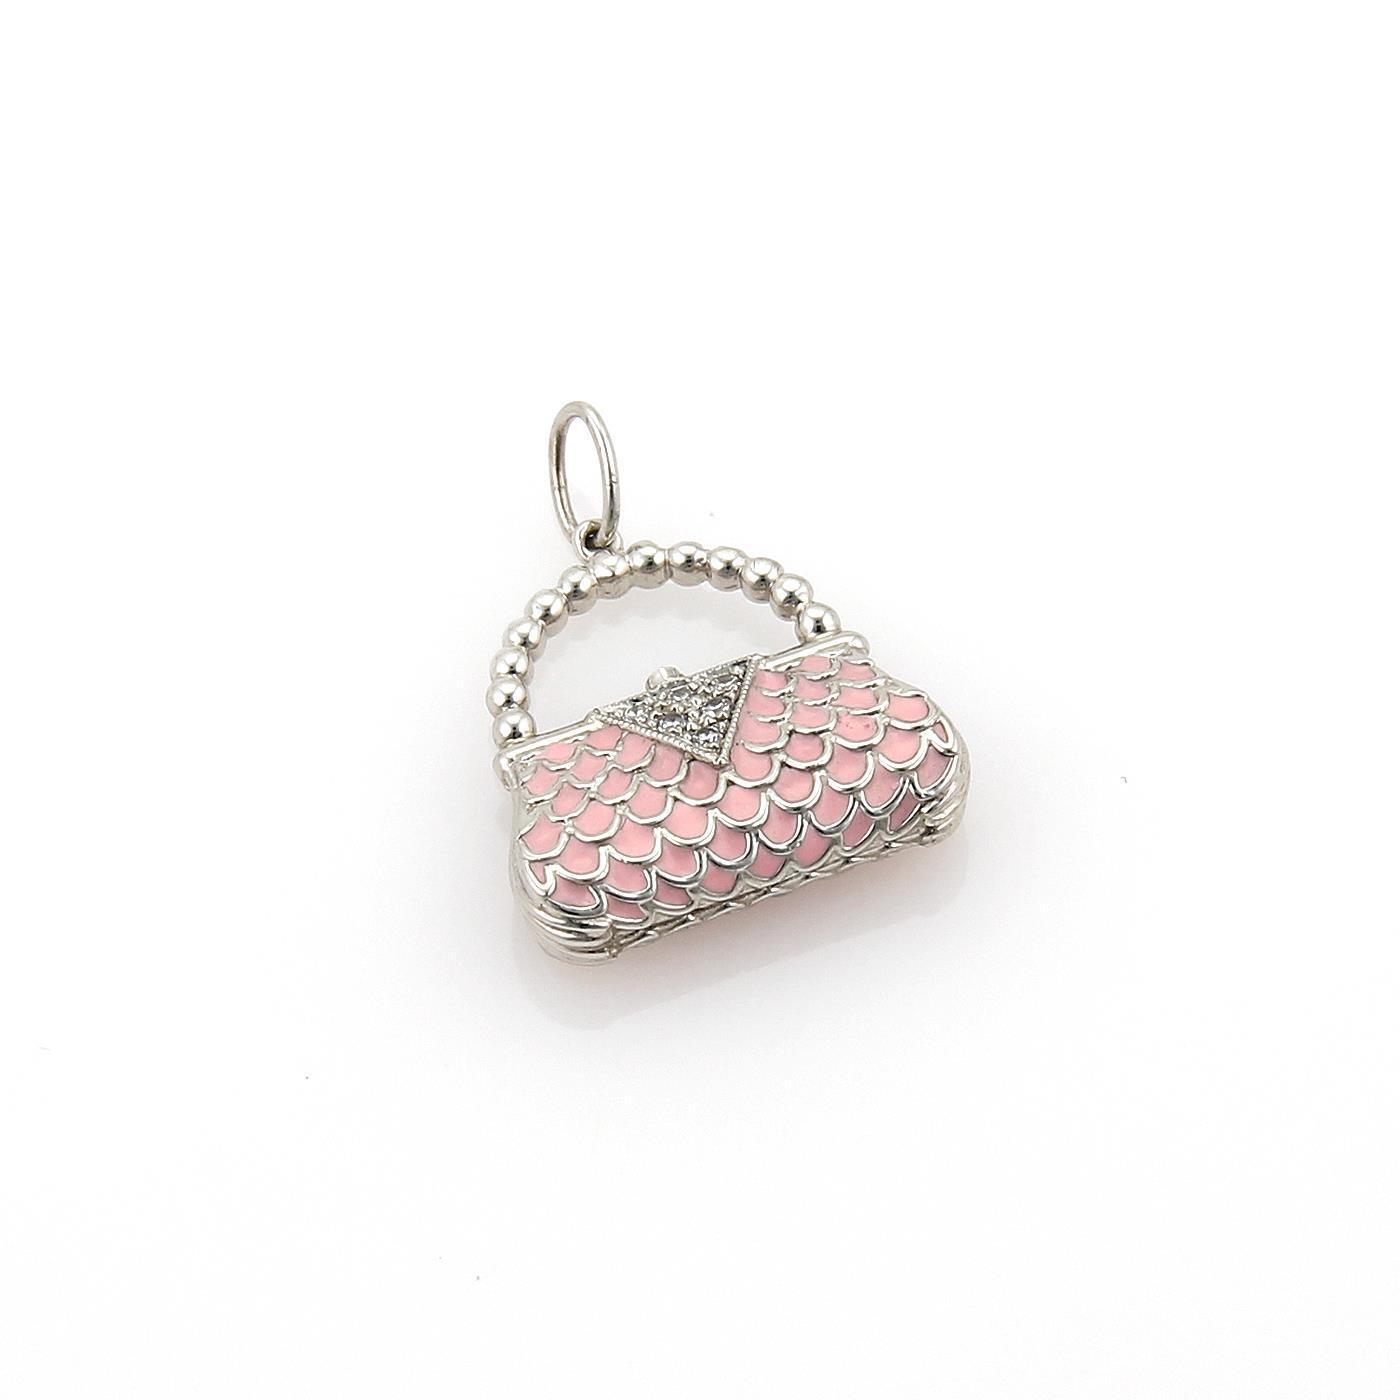 "Image of ""Tiffany & Co. Platinum Diamonds & Enamel Classic Clutch Purse Charm"""